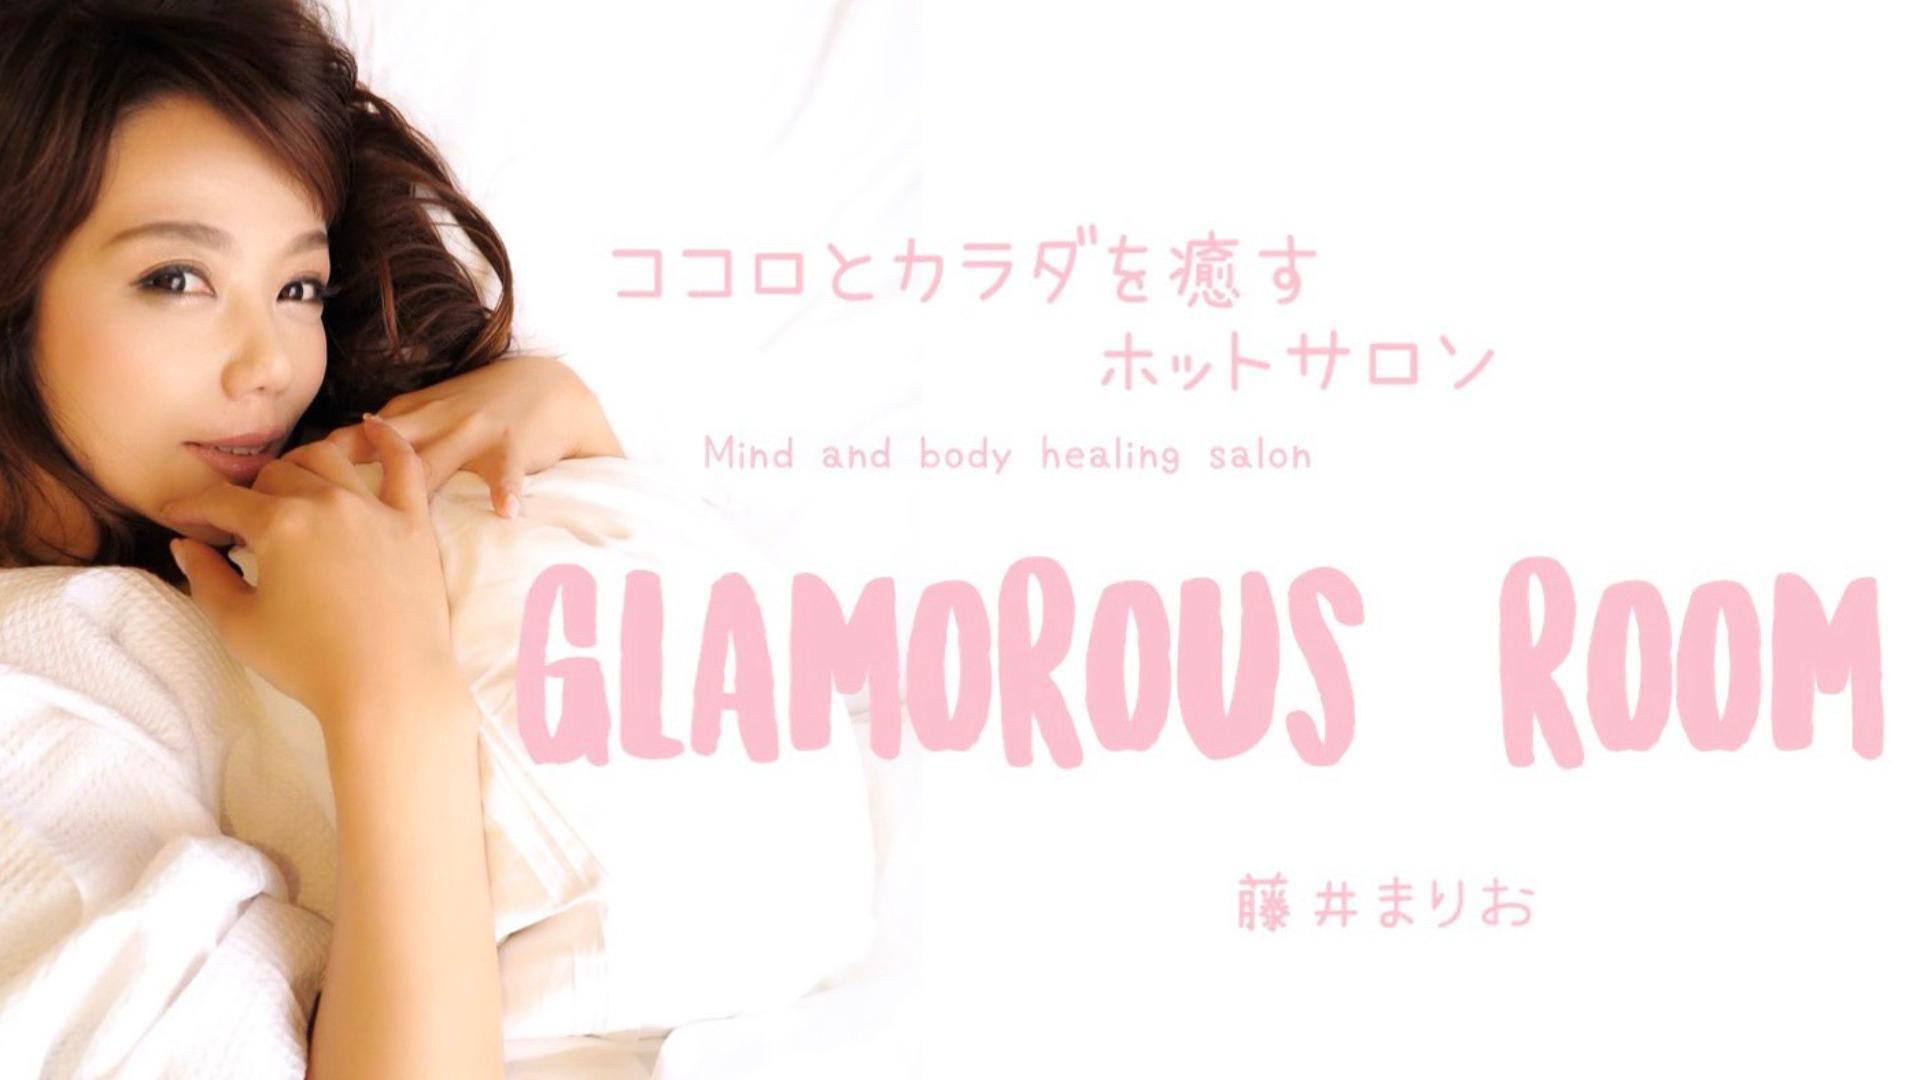 Glamorous room